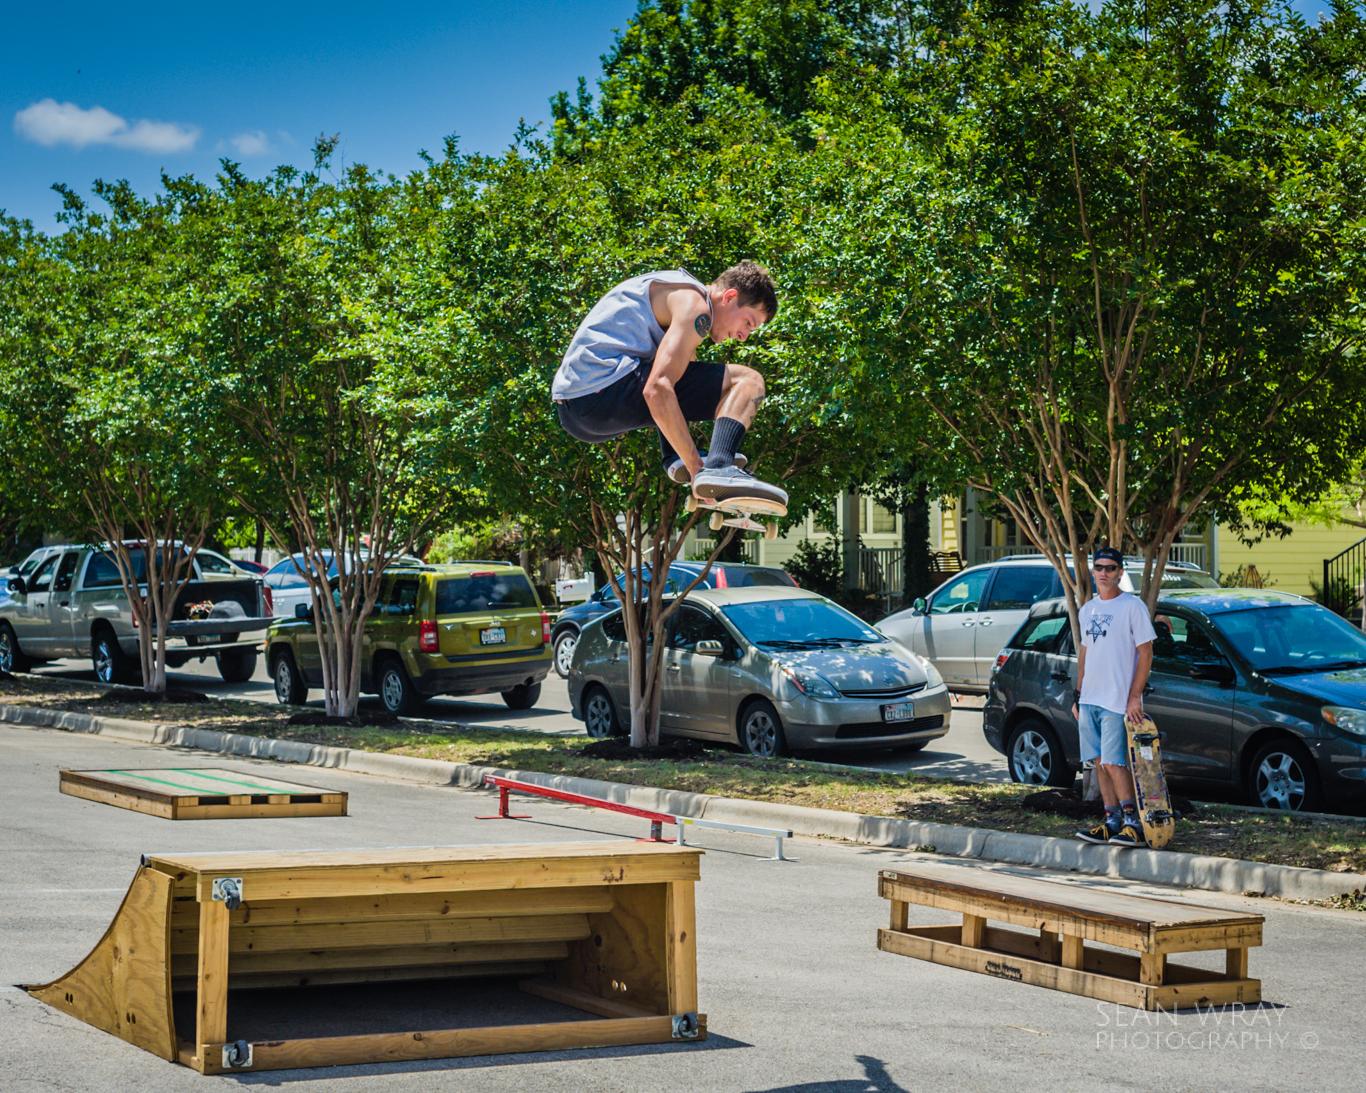 20140518_Skateboard_0002.jpg